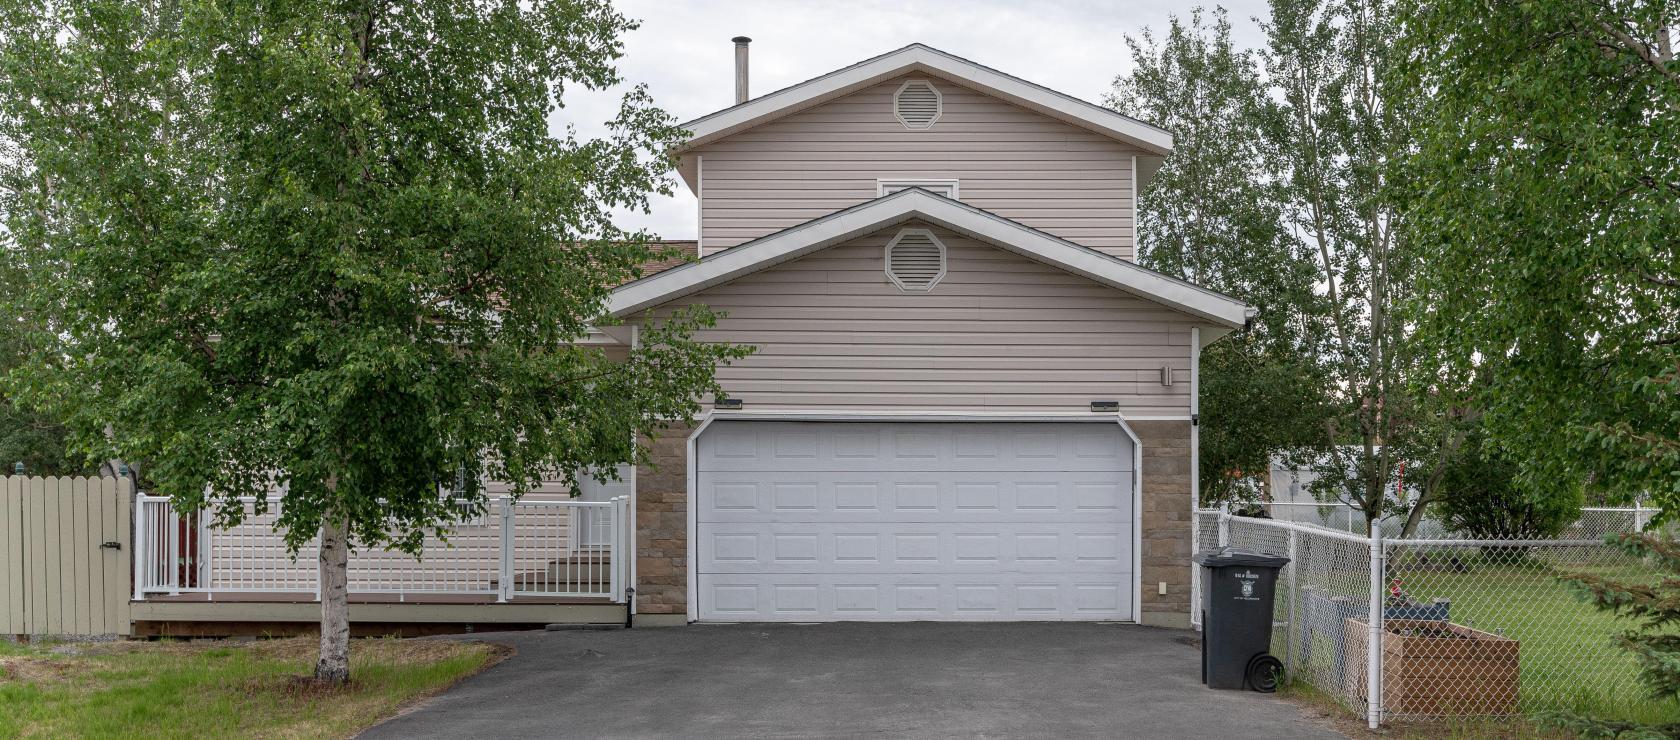 6203 Finlayson Drive N., Range Lake, Yellowknife 2